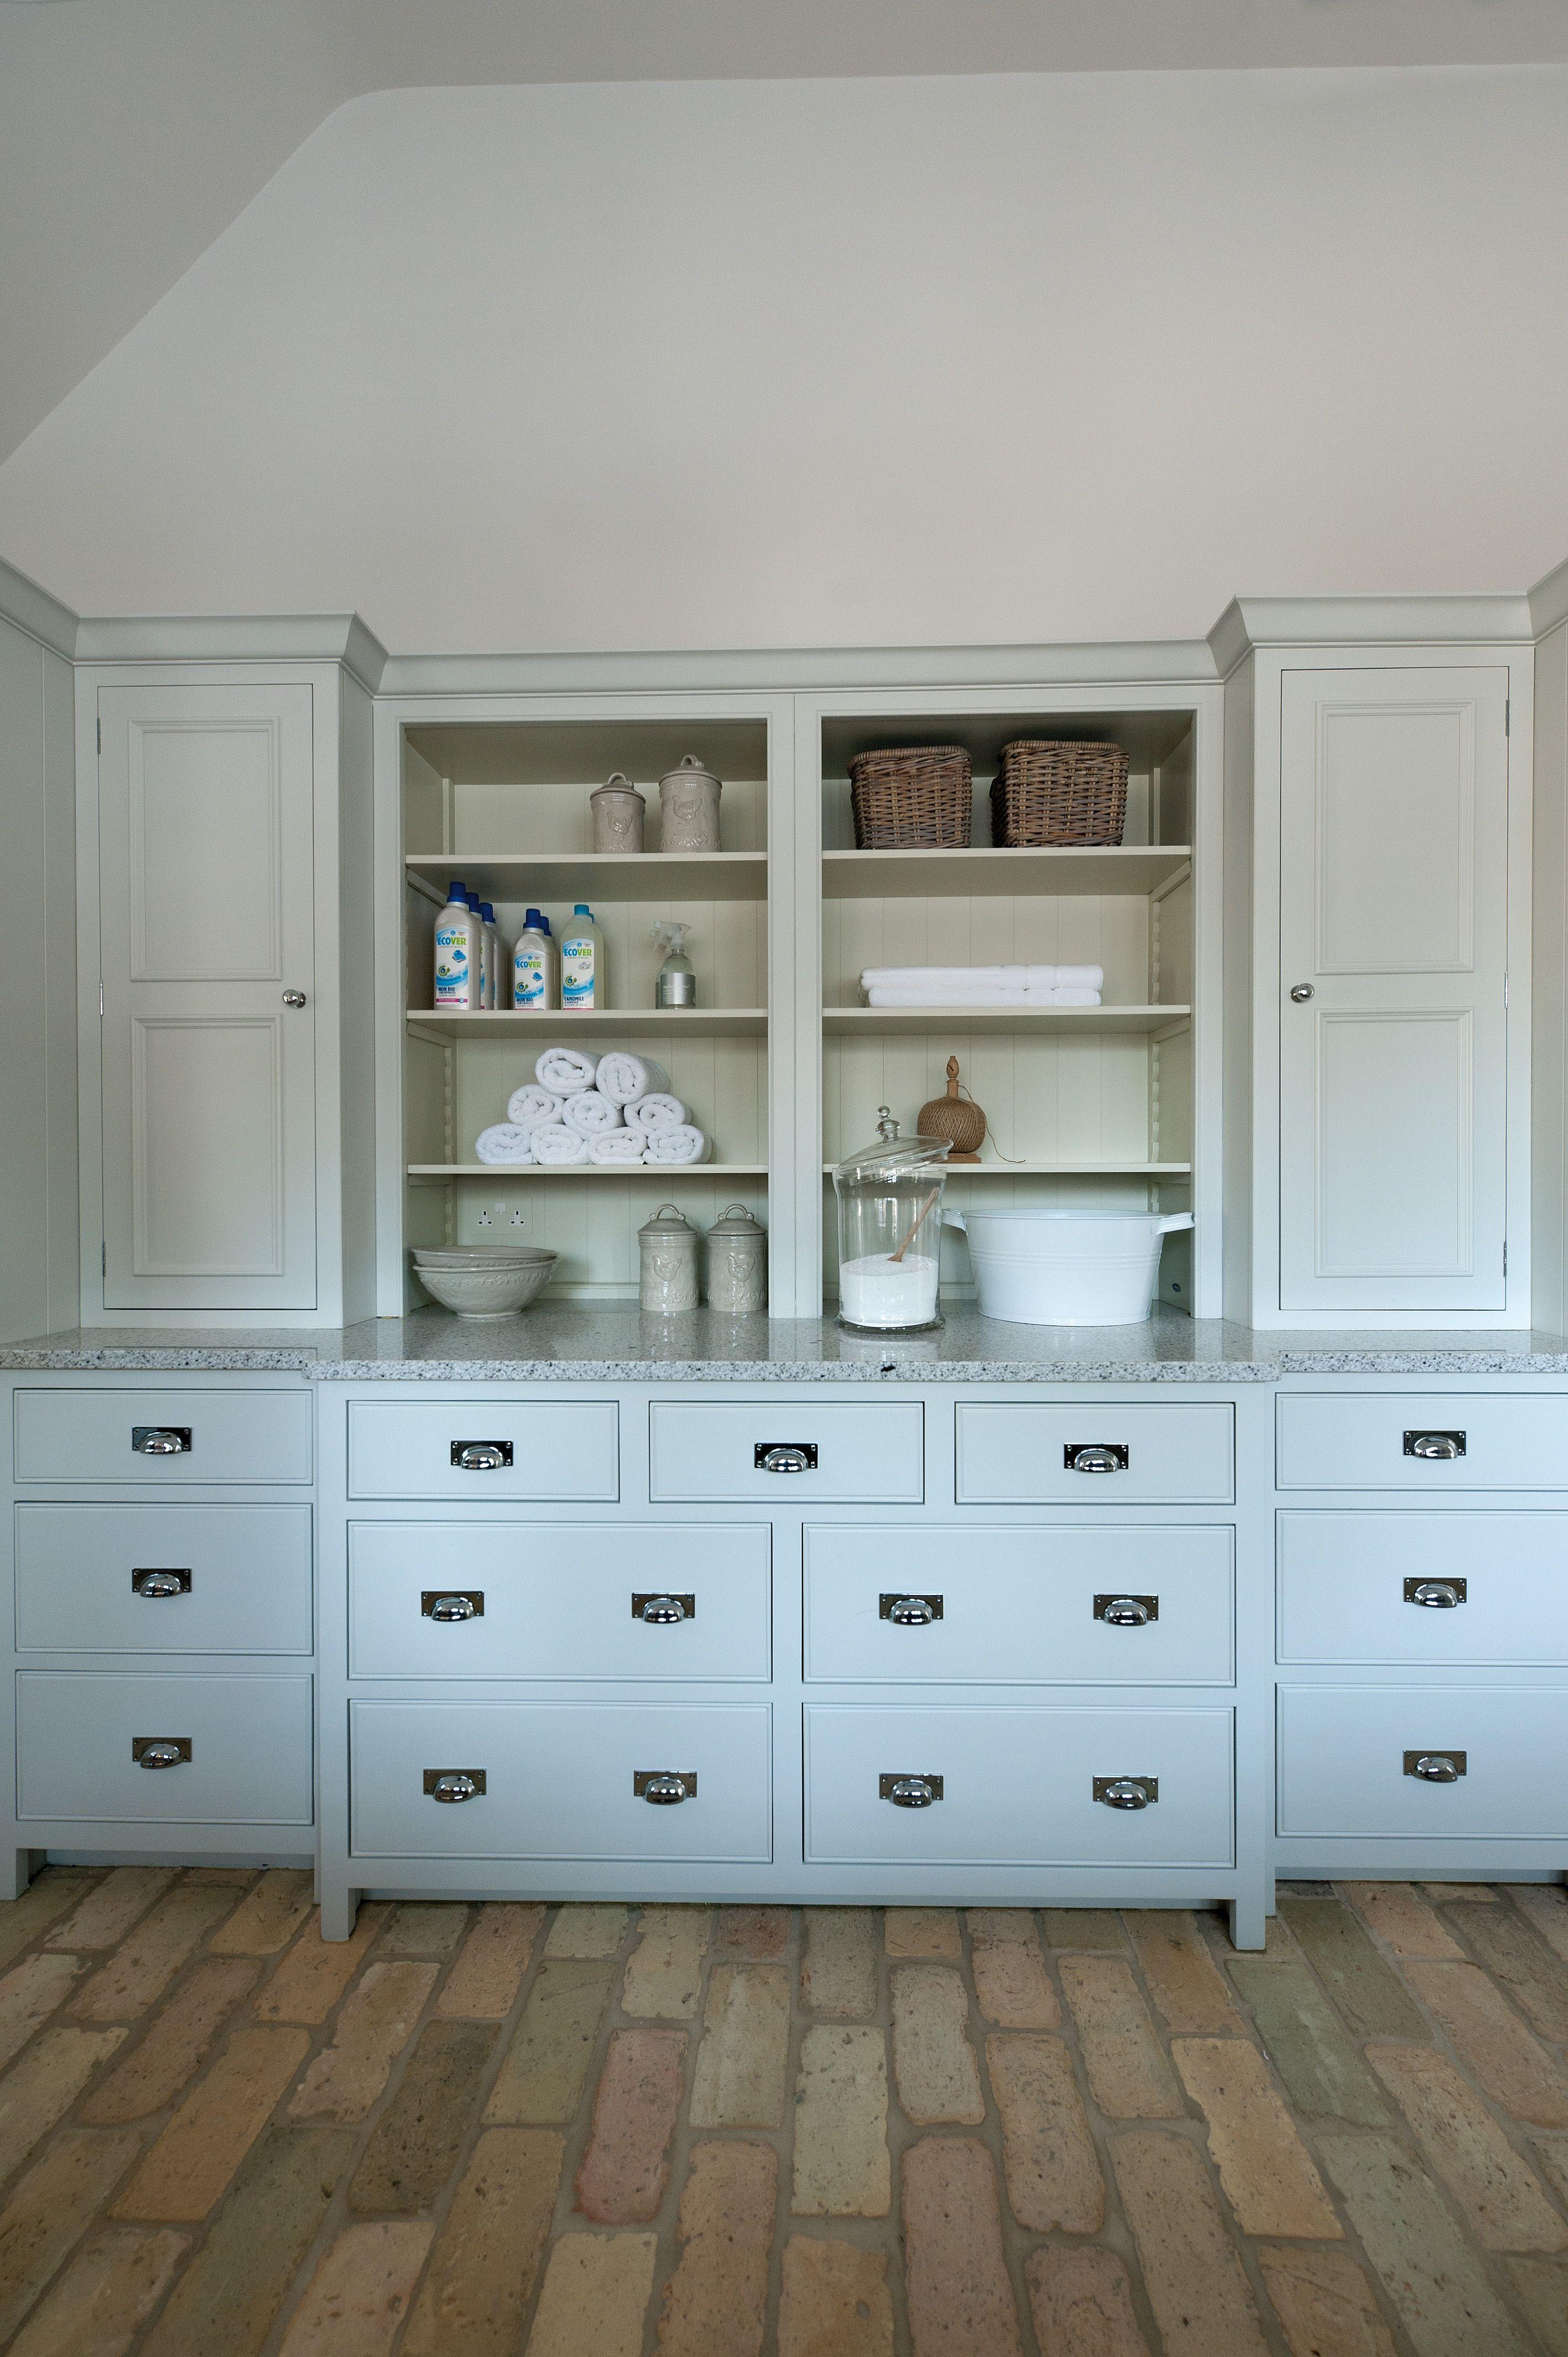 Neptune Chichester Kitchen | inspiration built-ins | Pinterest ...